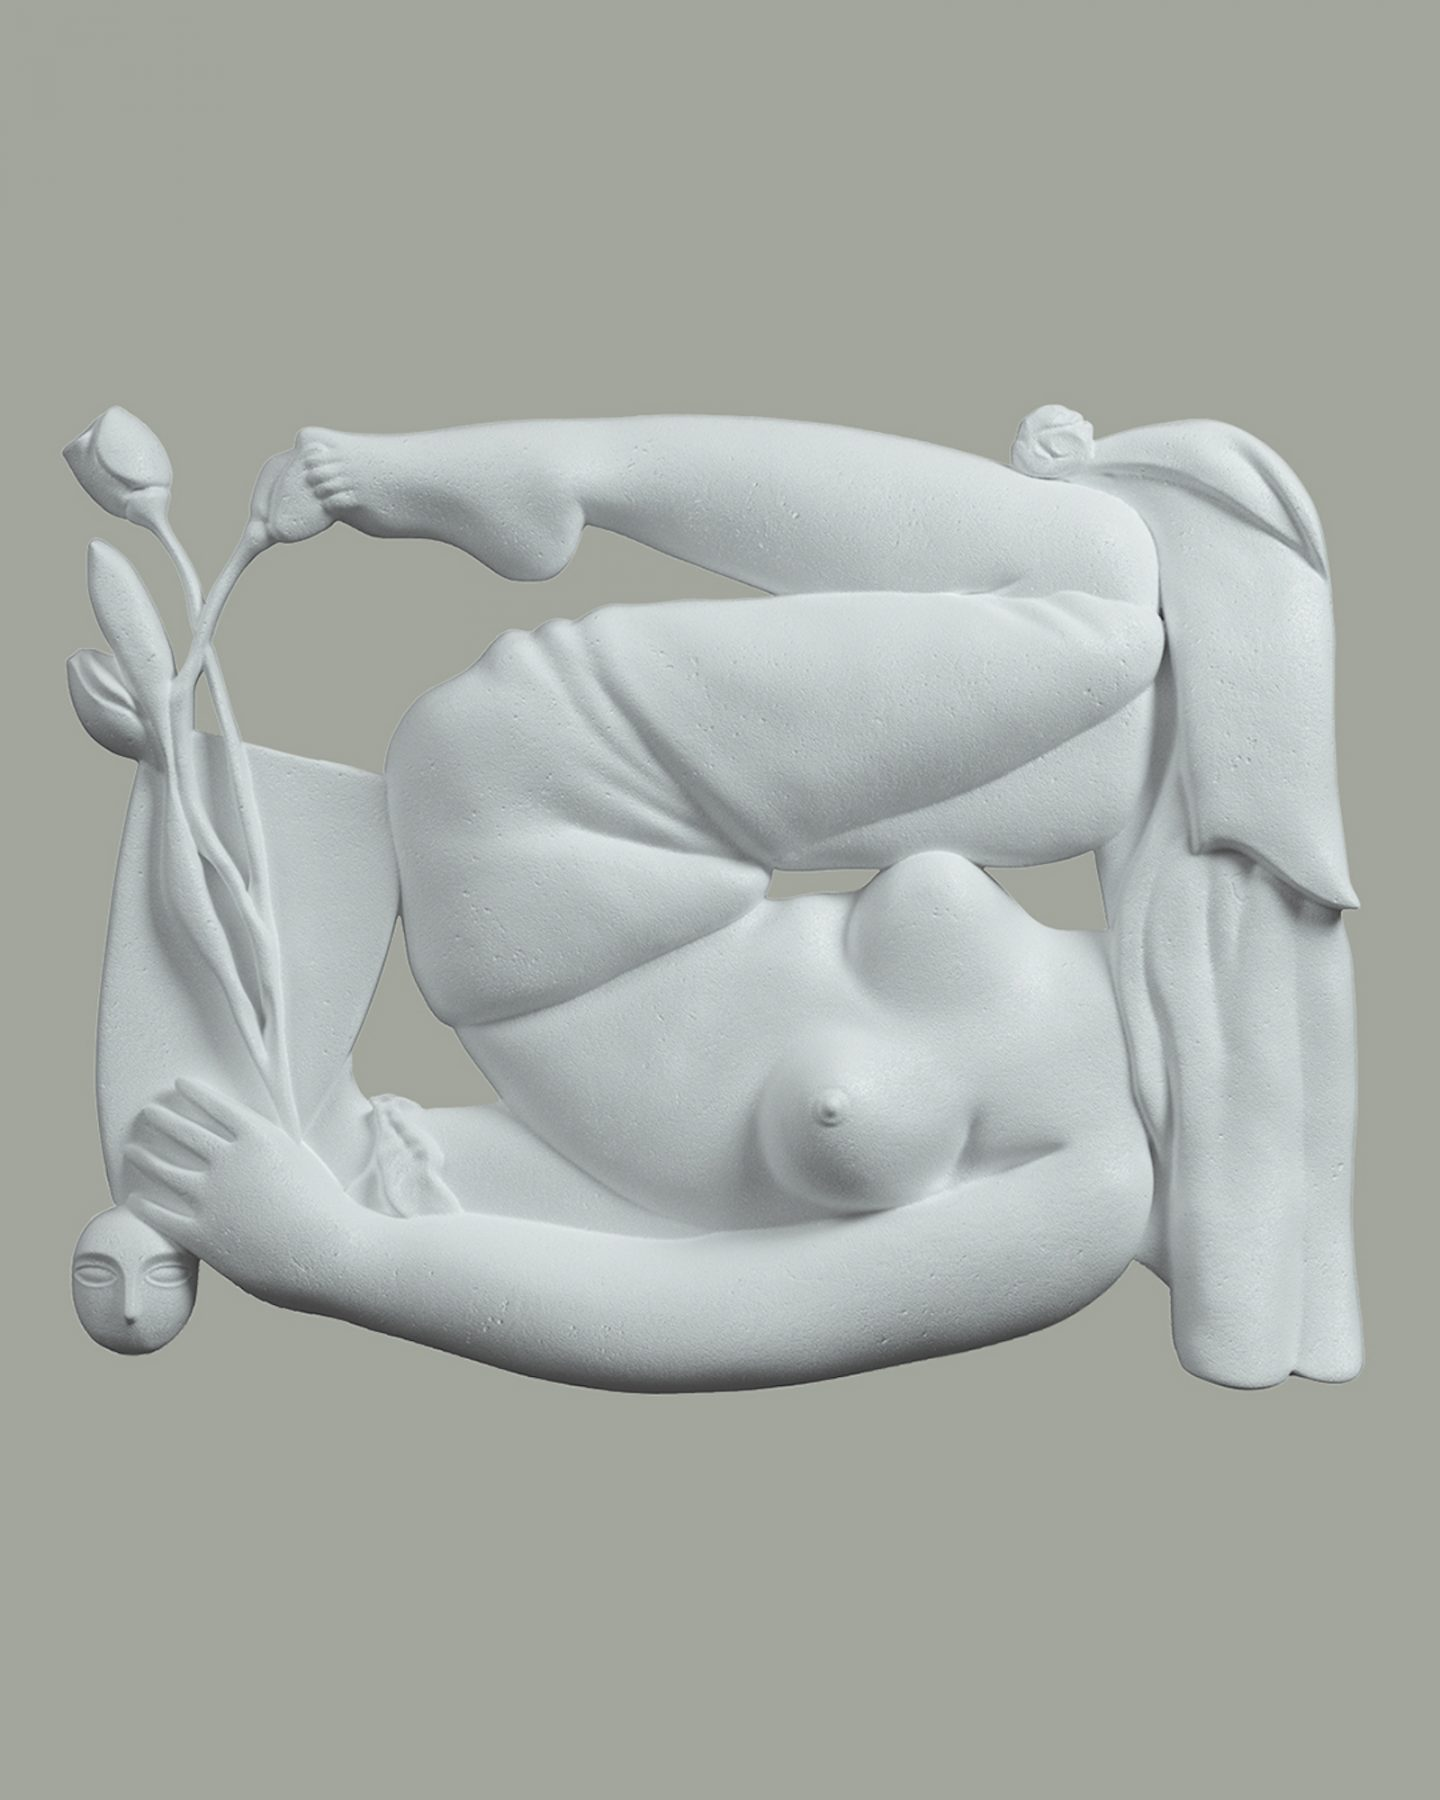 IGNANT-Art-Diane-Dal-Pra-Original-02